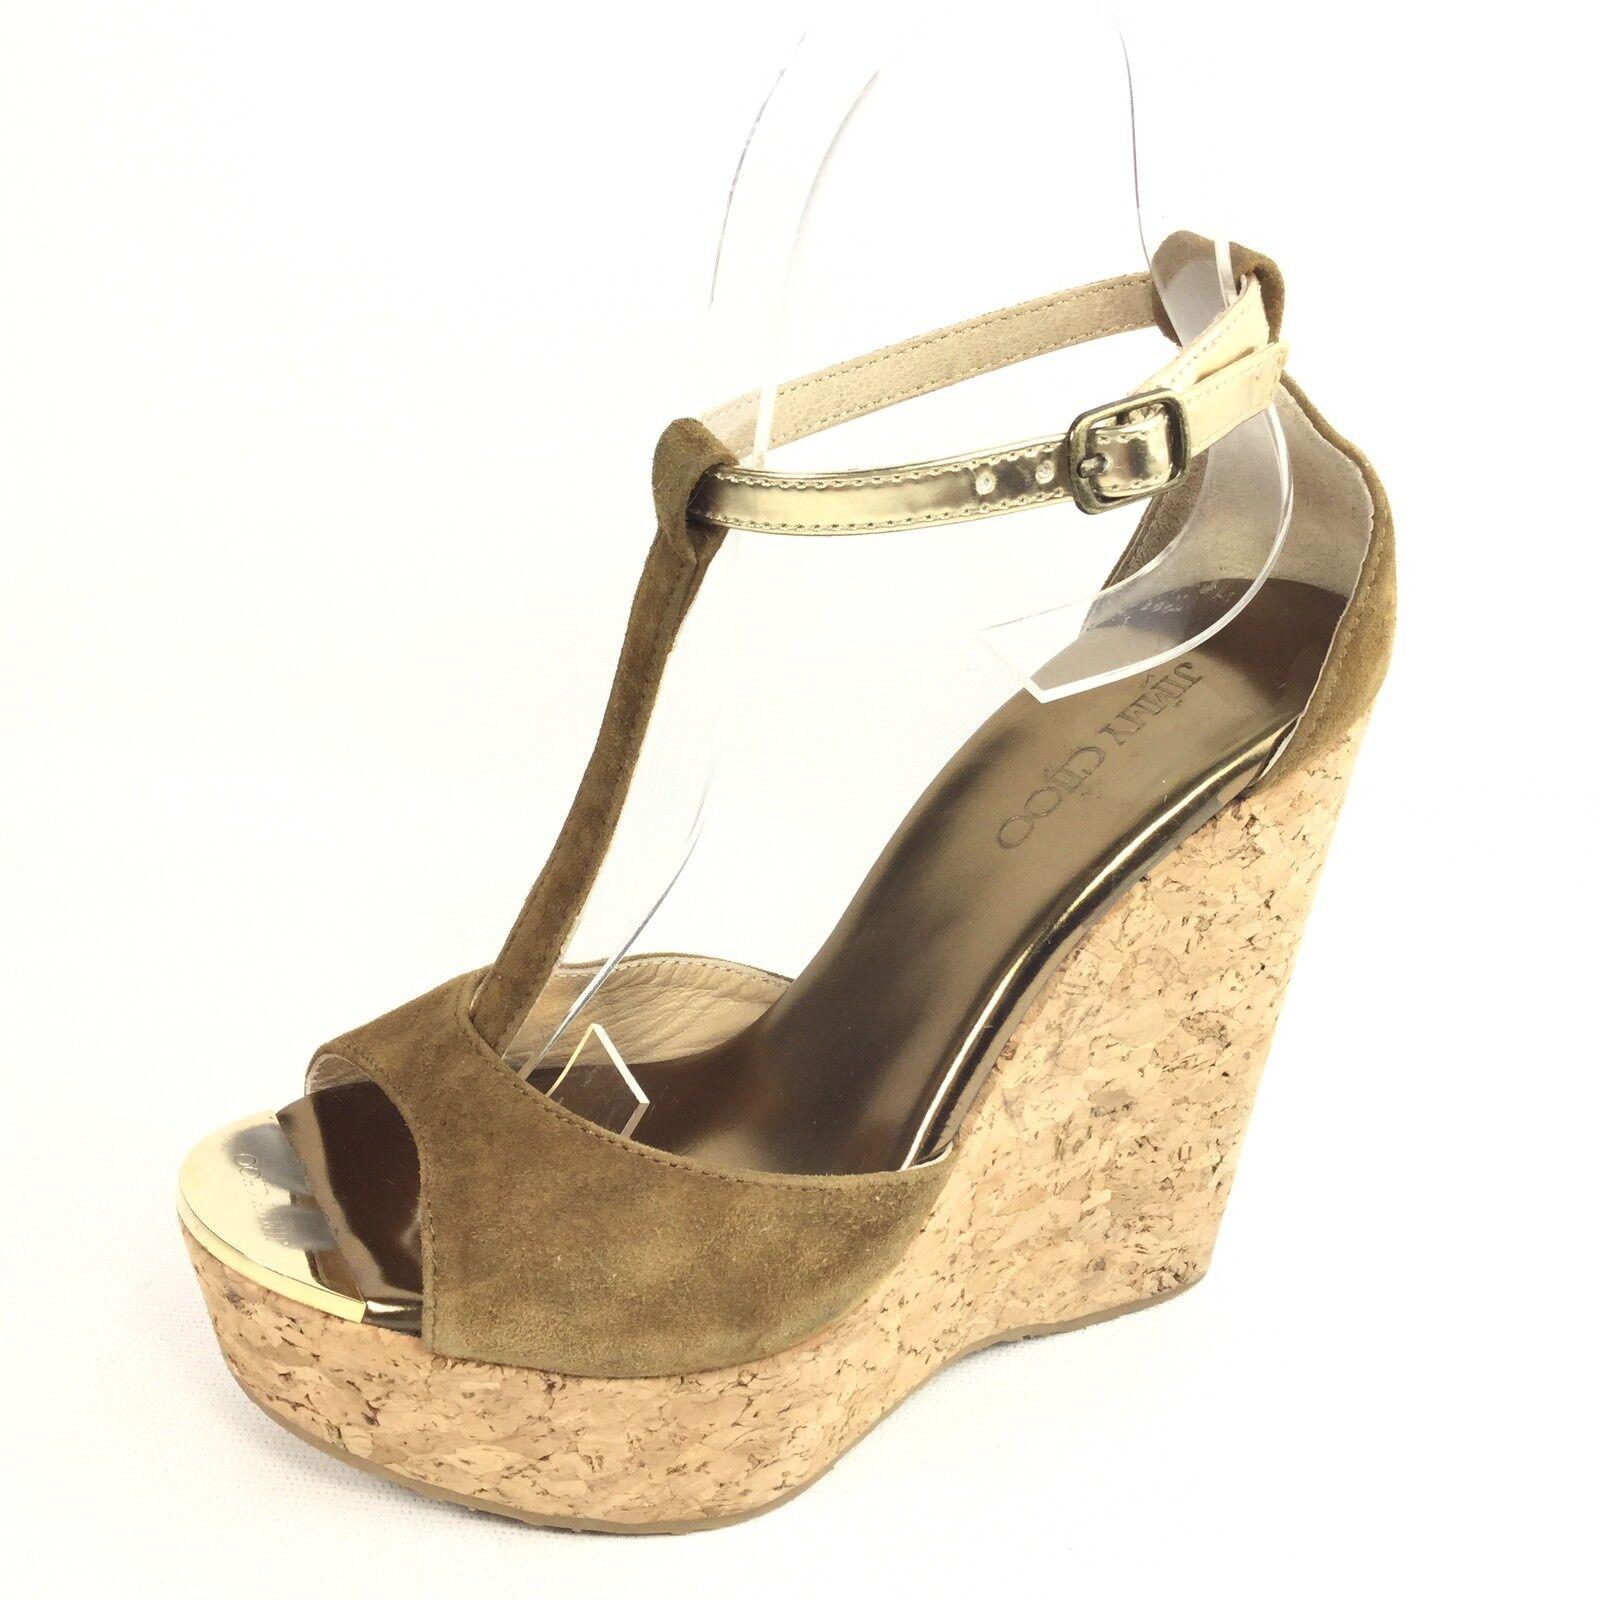 Jimmy Choo Womens Size 35 M Dark Green Suede Wedge T-strap Sandals